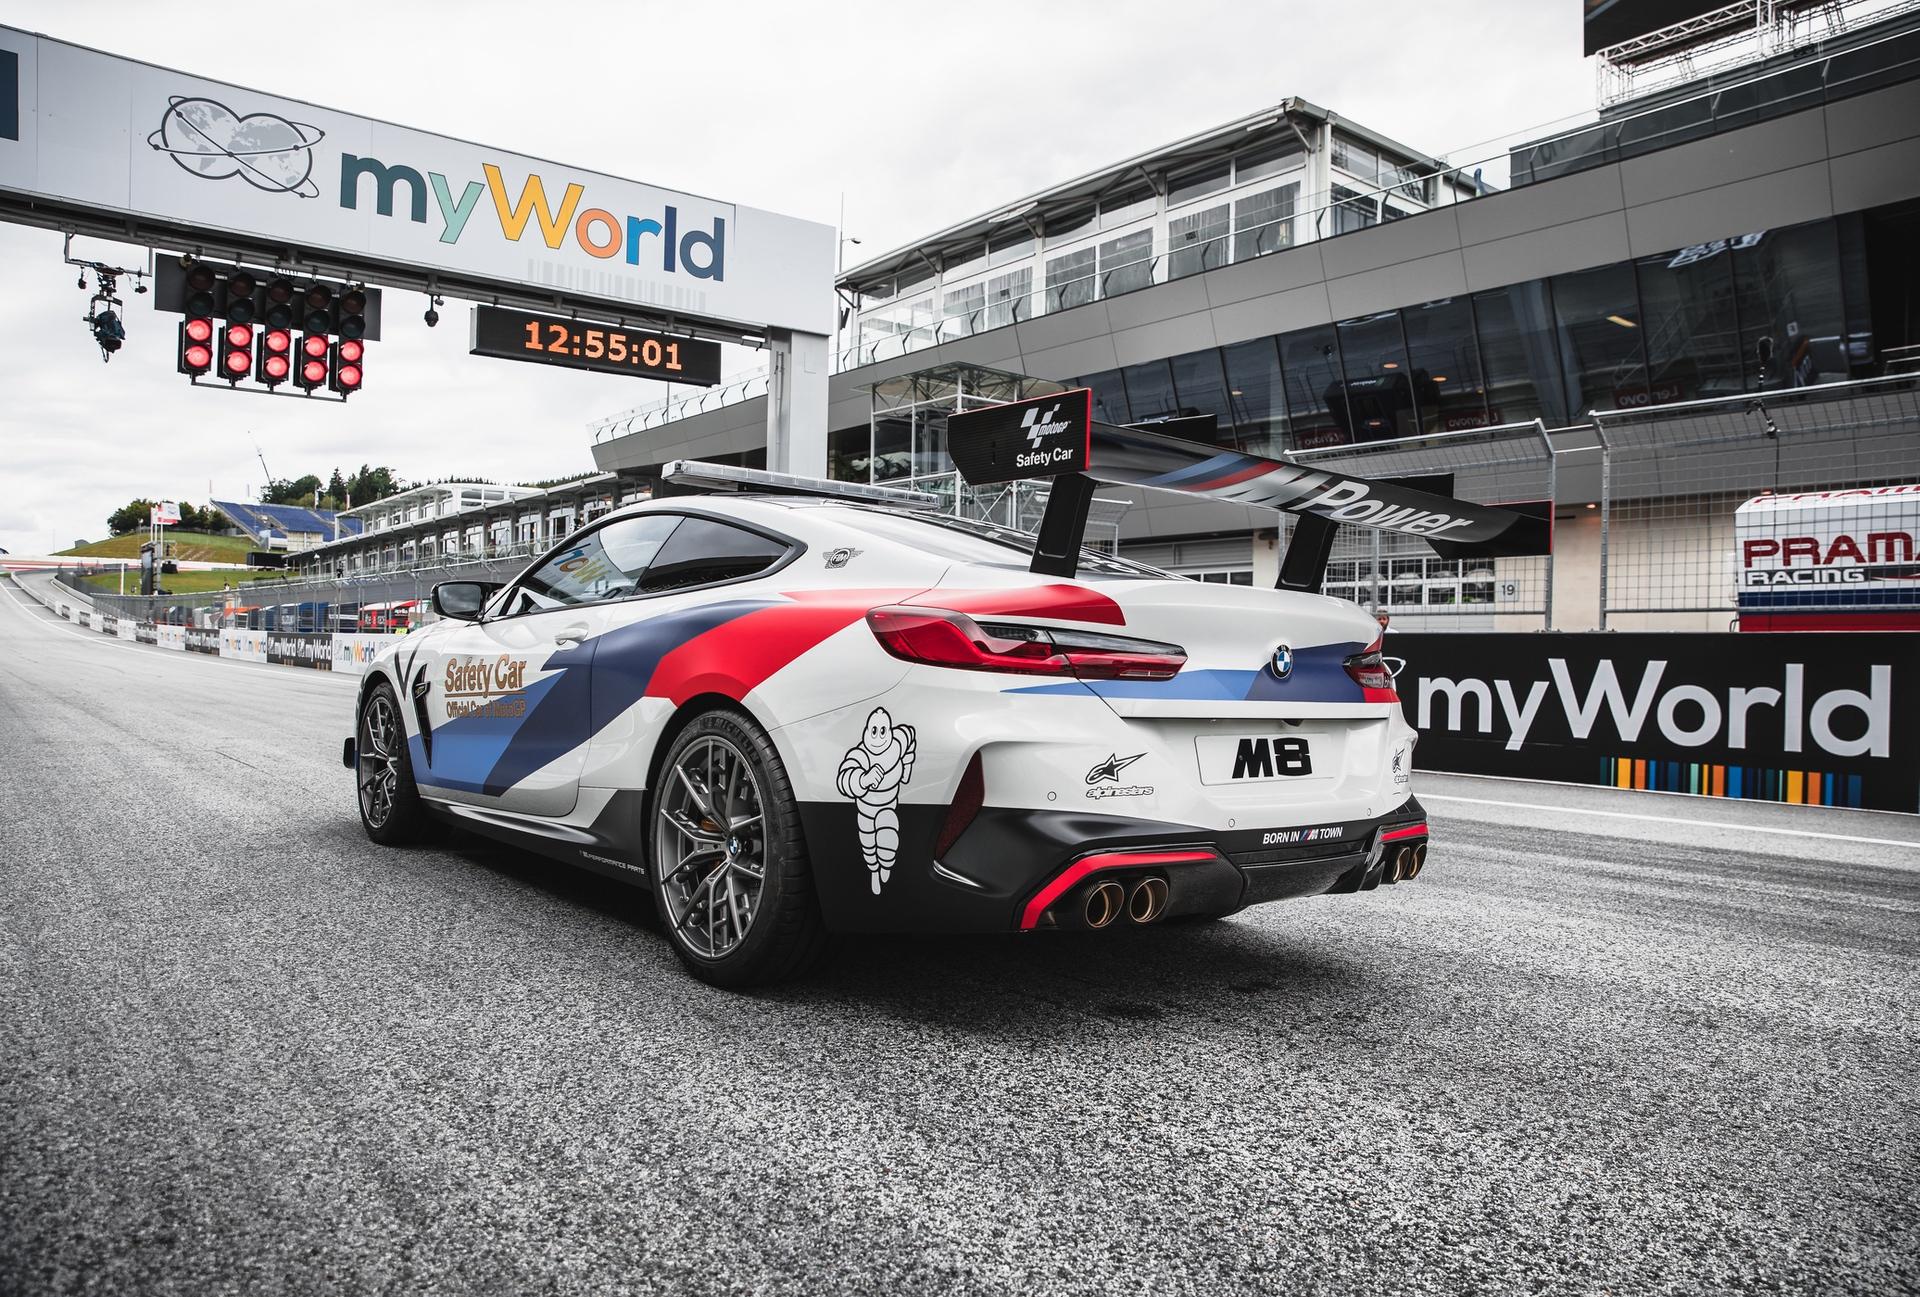 BMW_M8_MotoGP_Safety_Car_0034